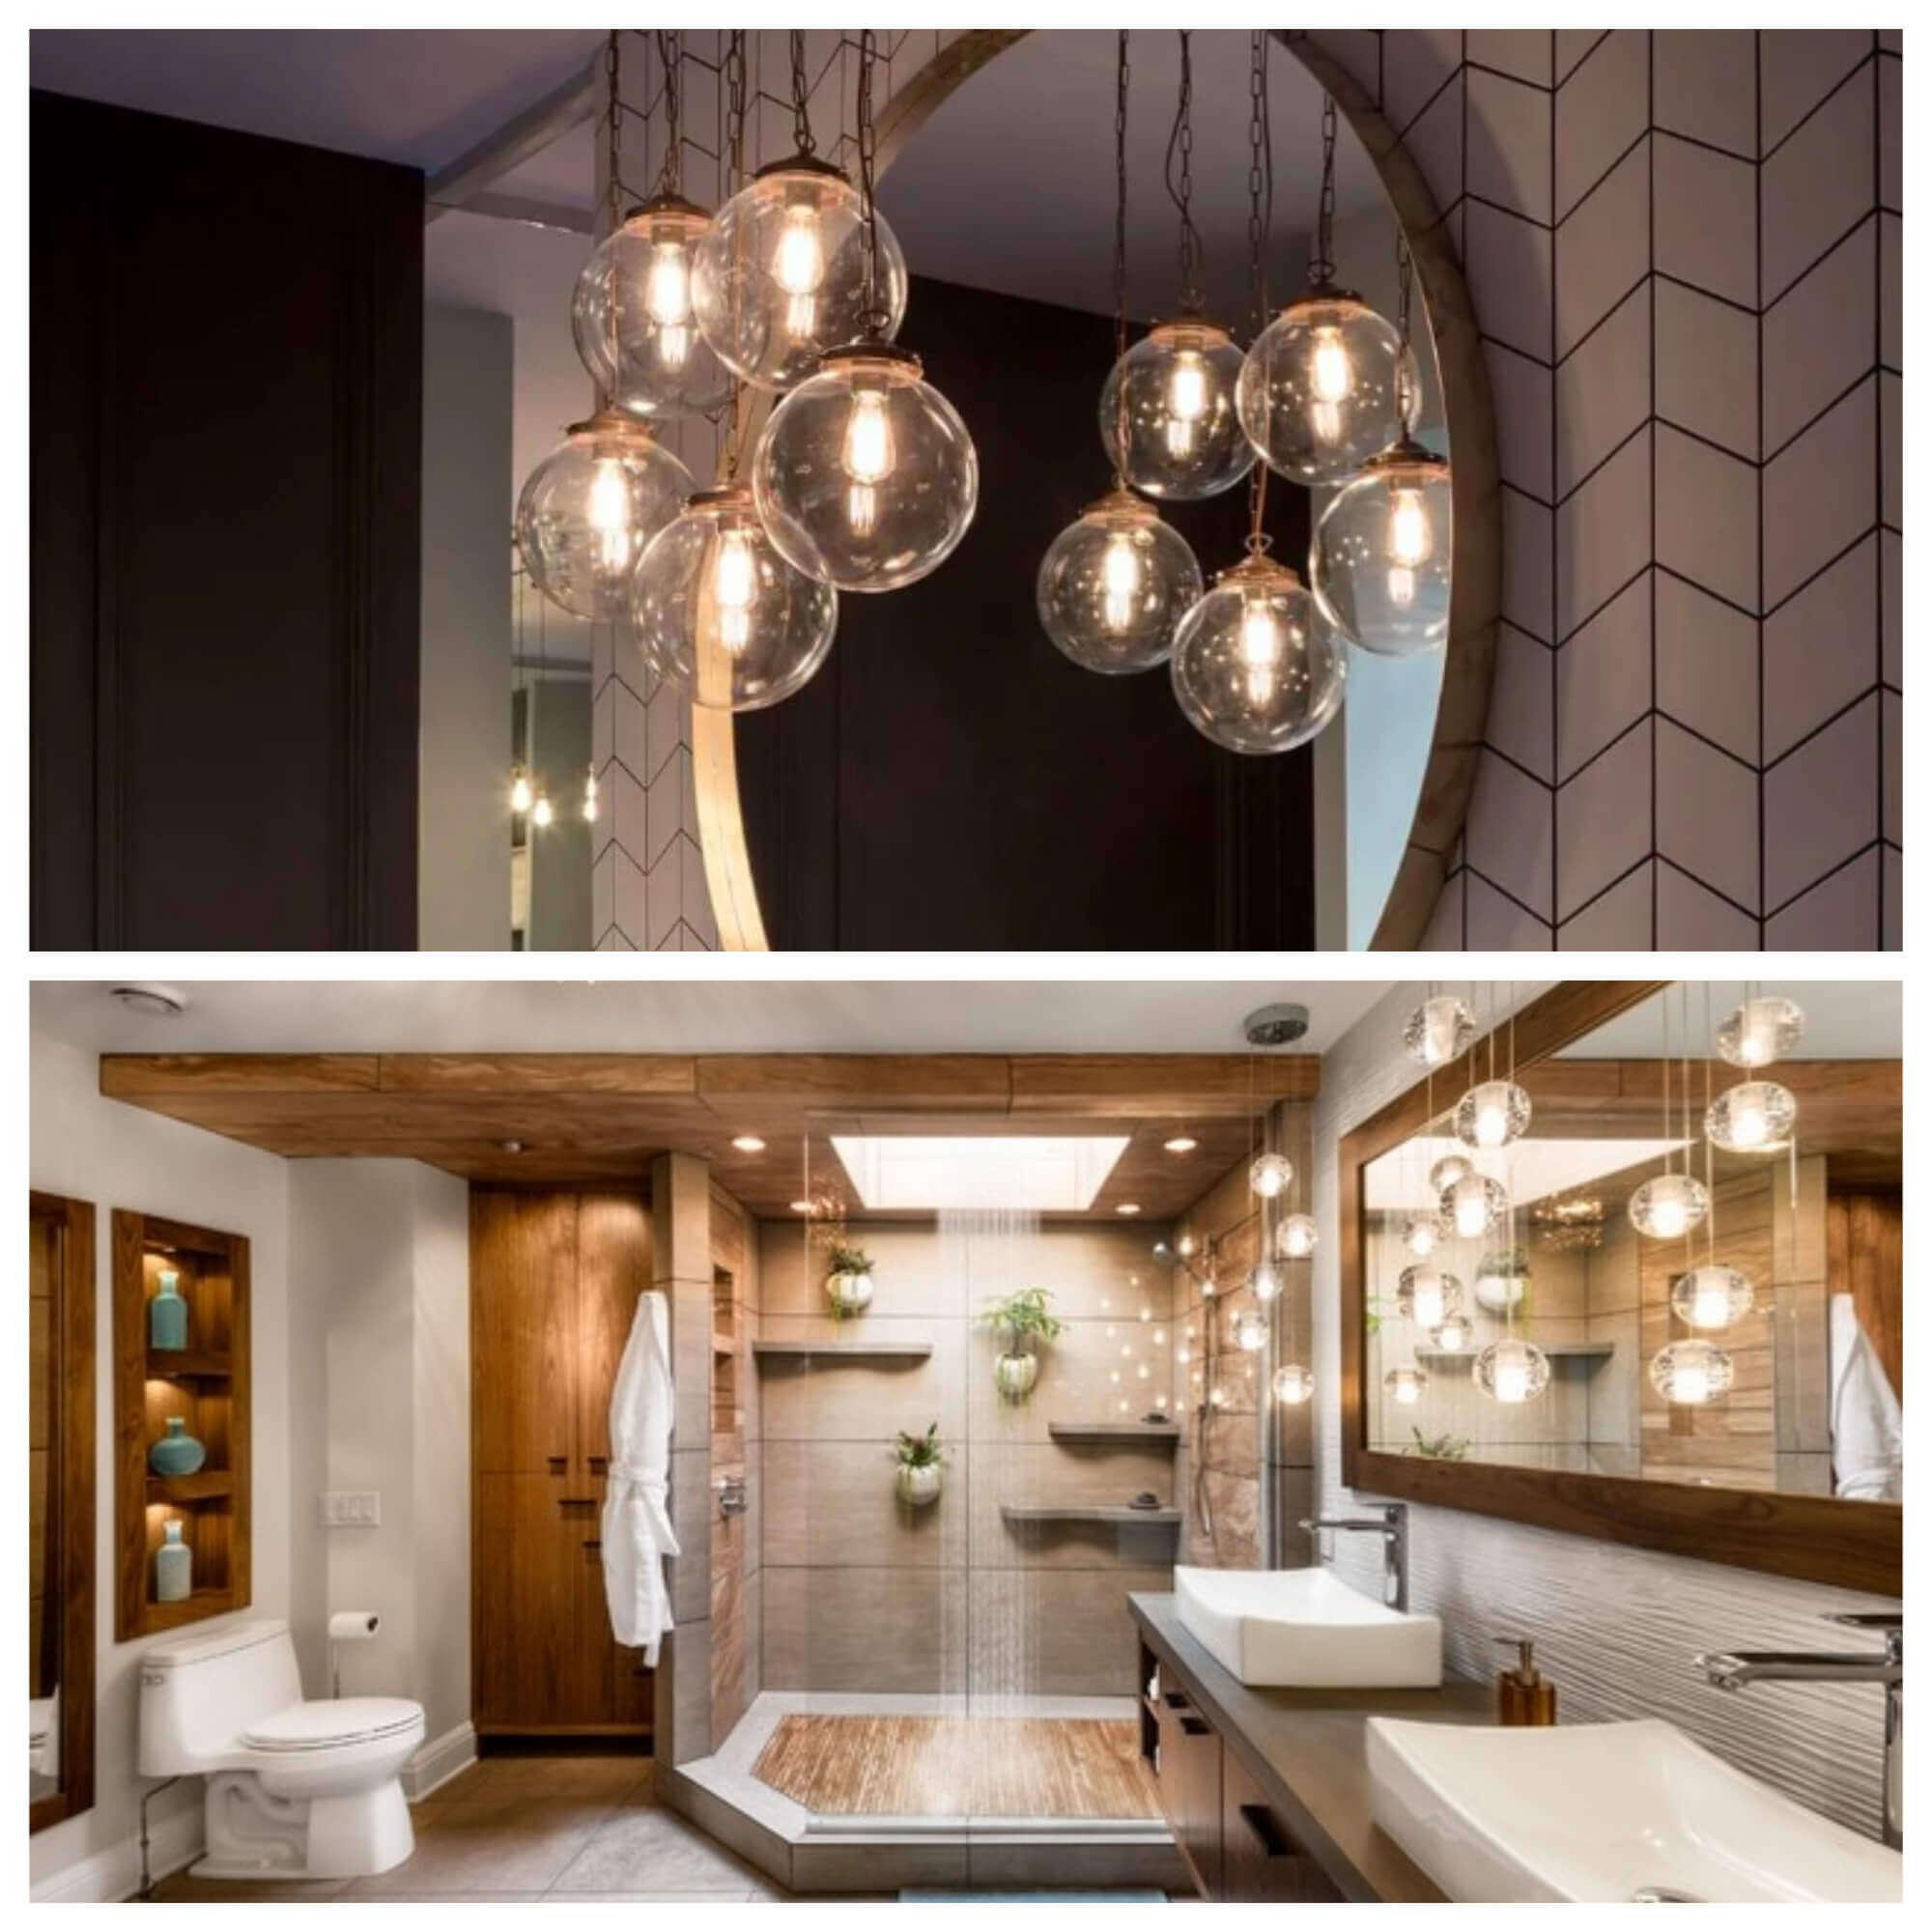 9 Lighting Ideas for Your Bathroom Design- Create a Cluster